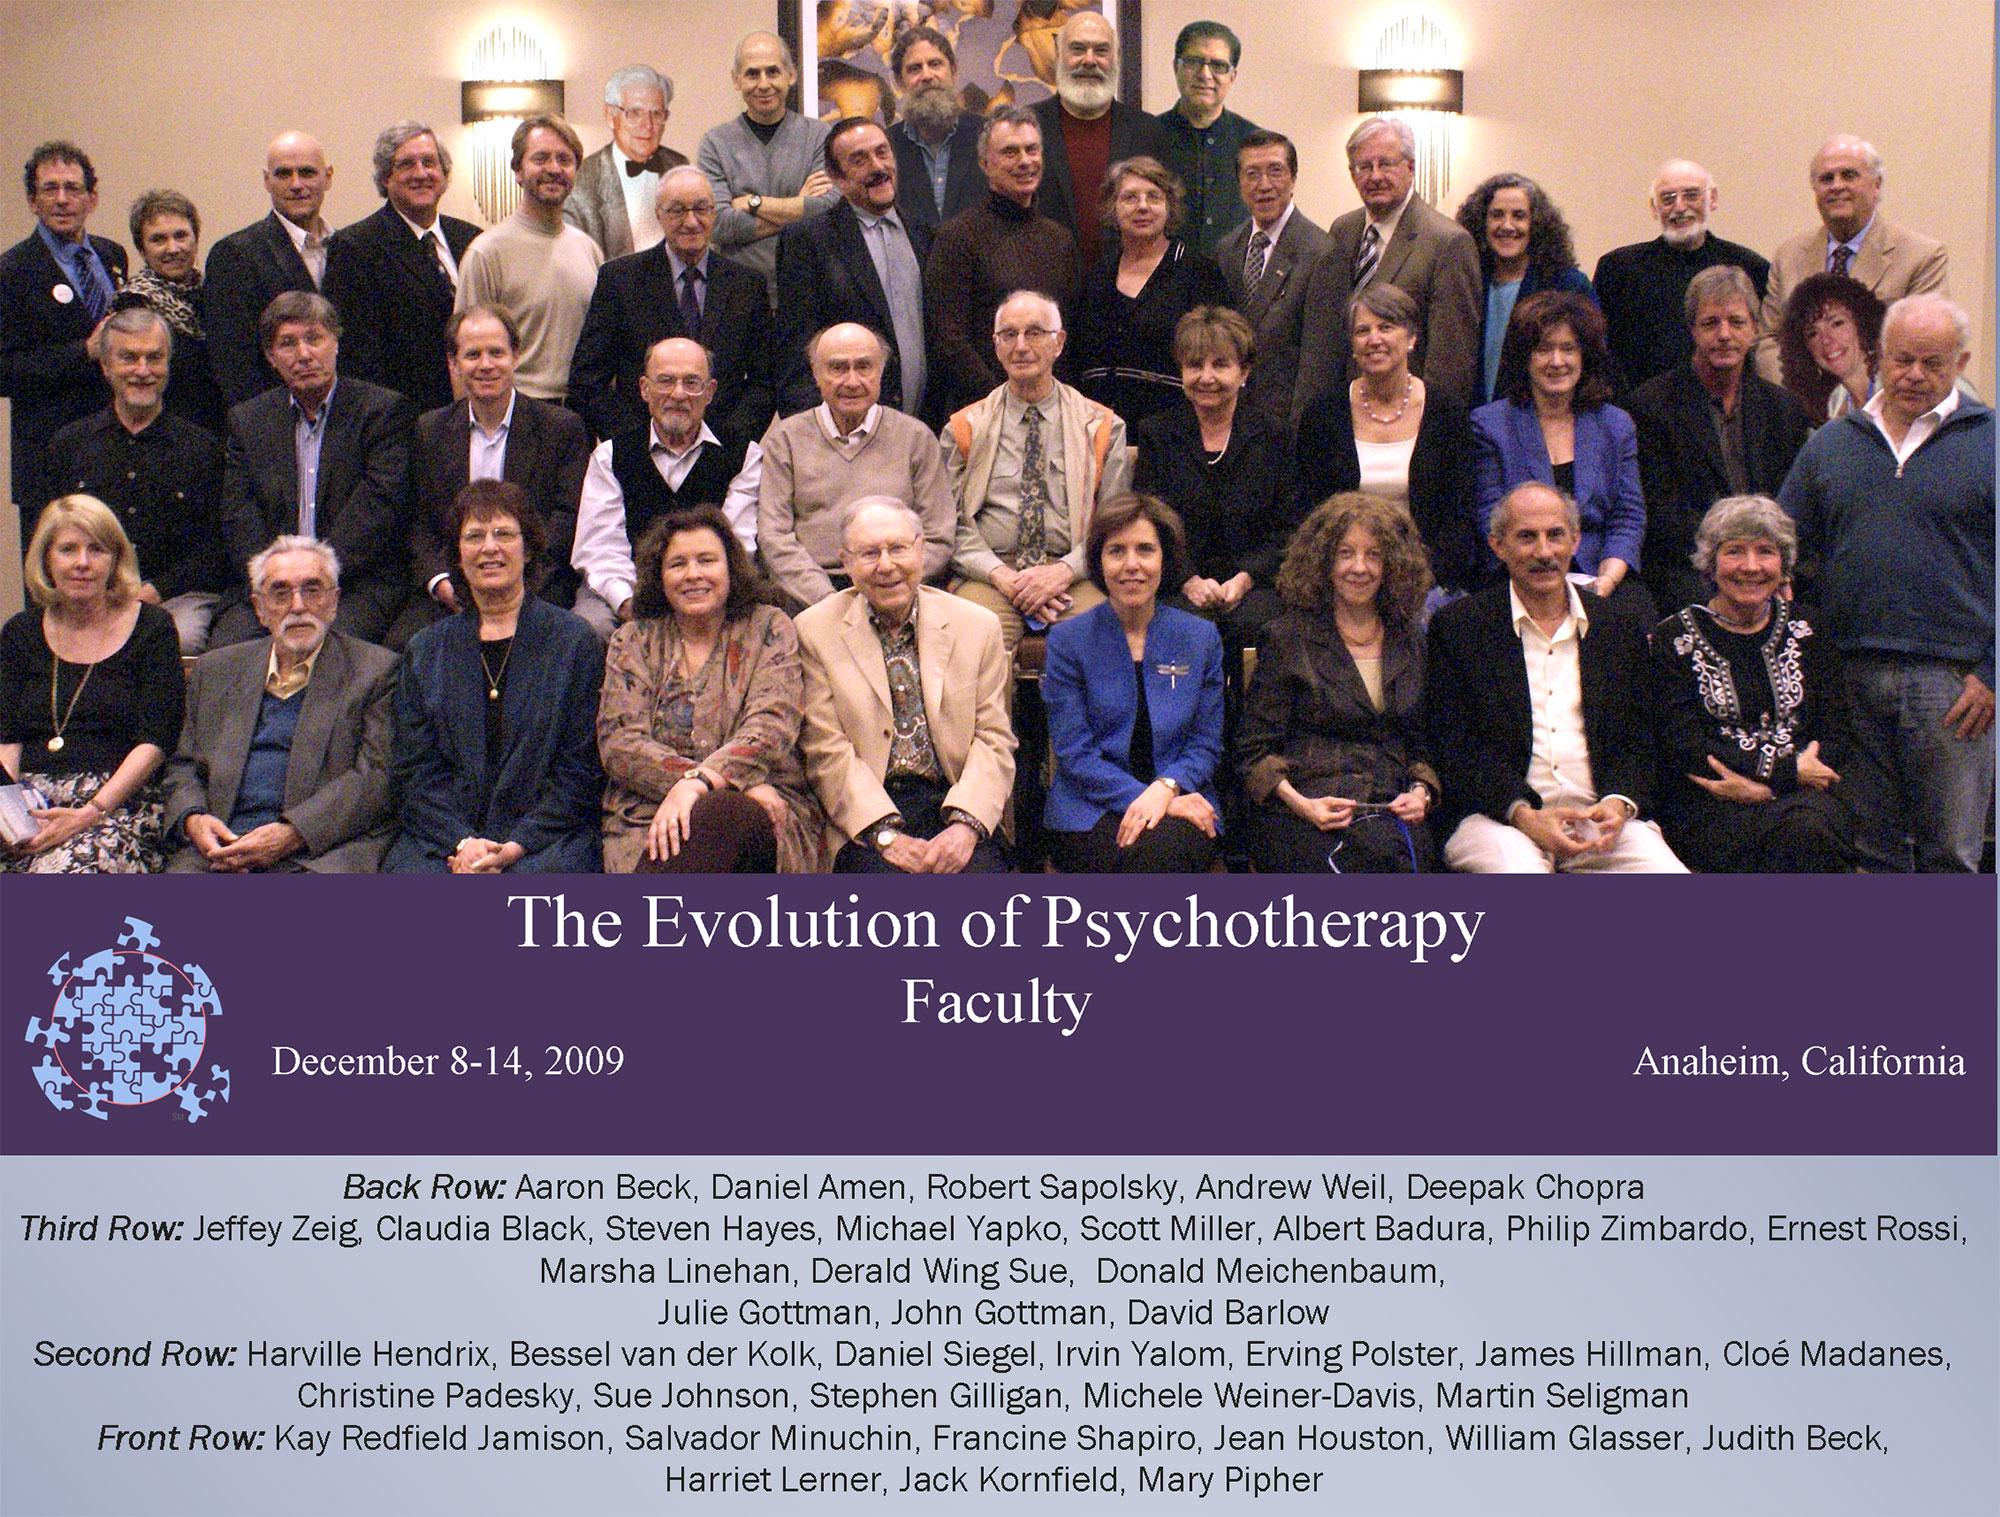 Evolution 2009 Faculty Group Photo